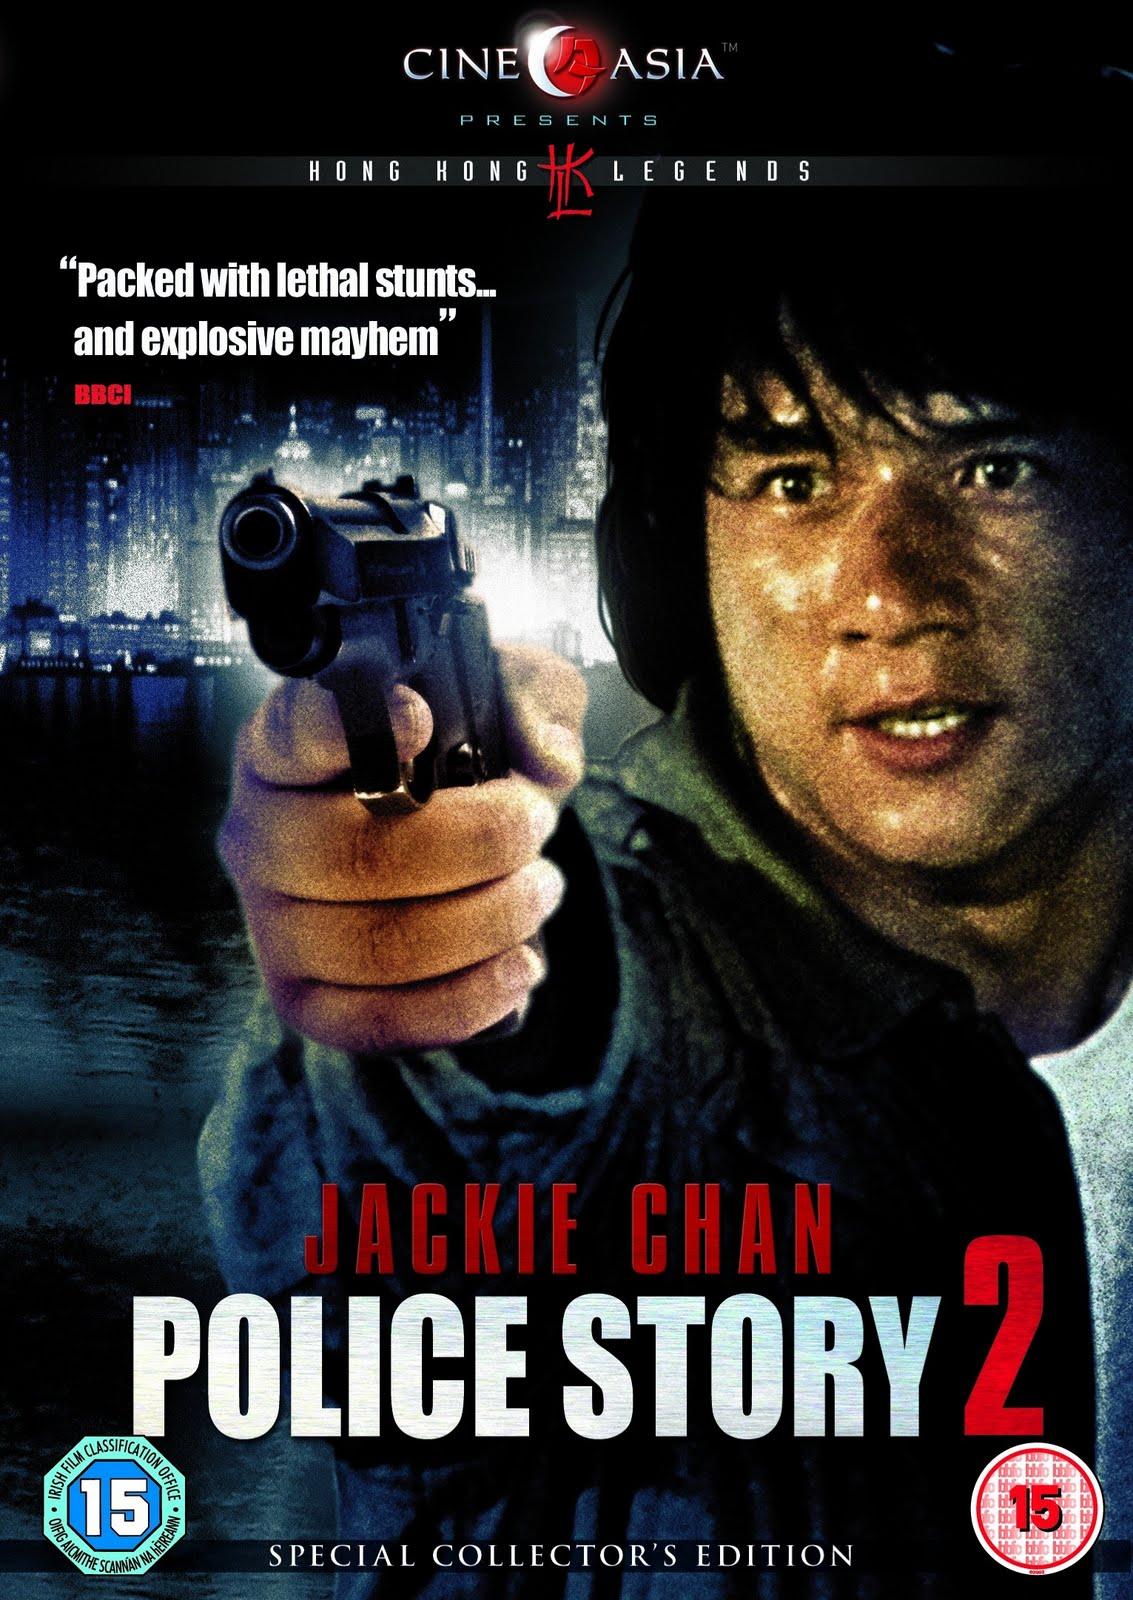 http://3.bp.blogspot.com/-TshCvxwe6L0/T9sNNYGypdI/AAAAAAAADSc/b5jPXPAiXt4/s1600/Police+Story+2.jpg